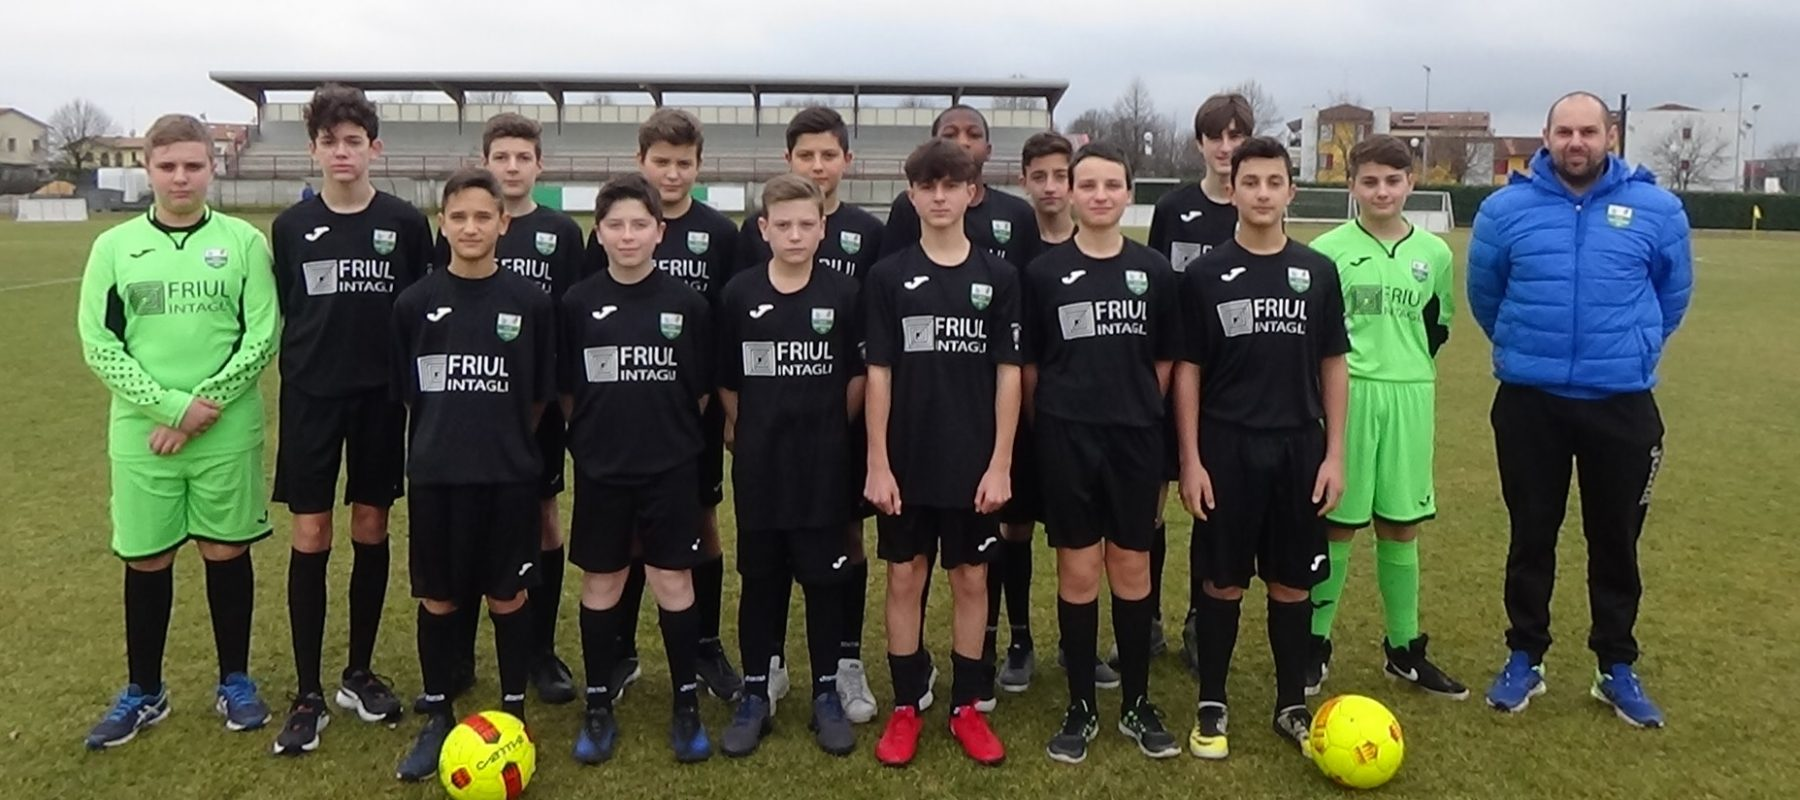 Calendario Giovanissimi Provinciali.Giovanissimi Provinciali U15 Girone B Treviso Acd